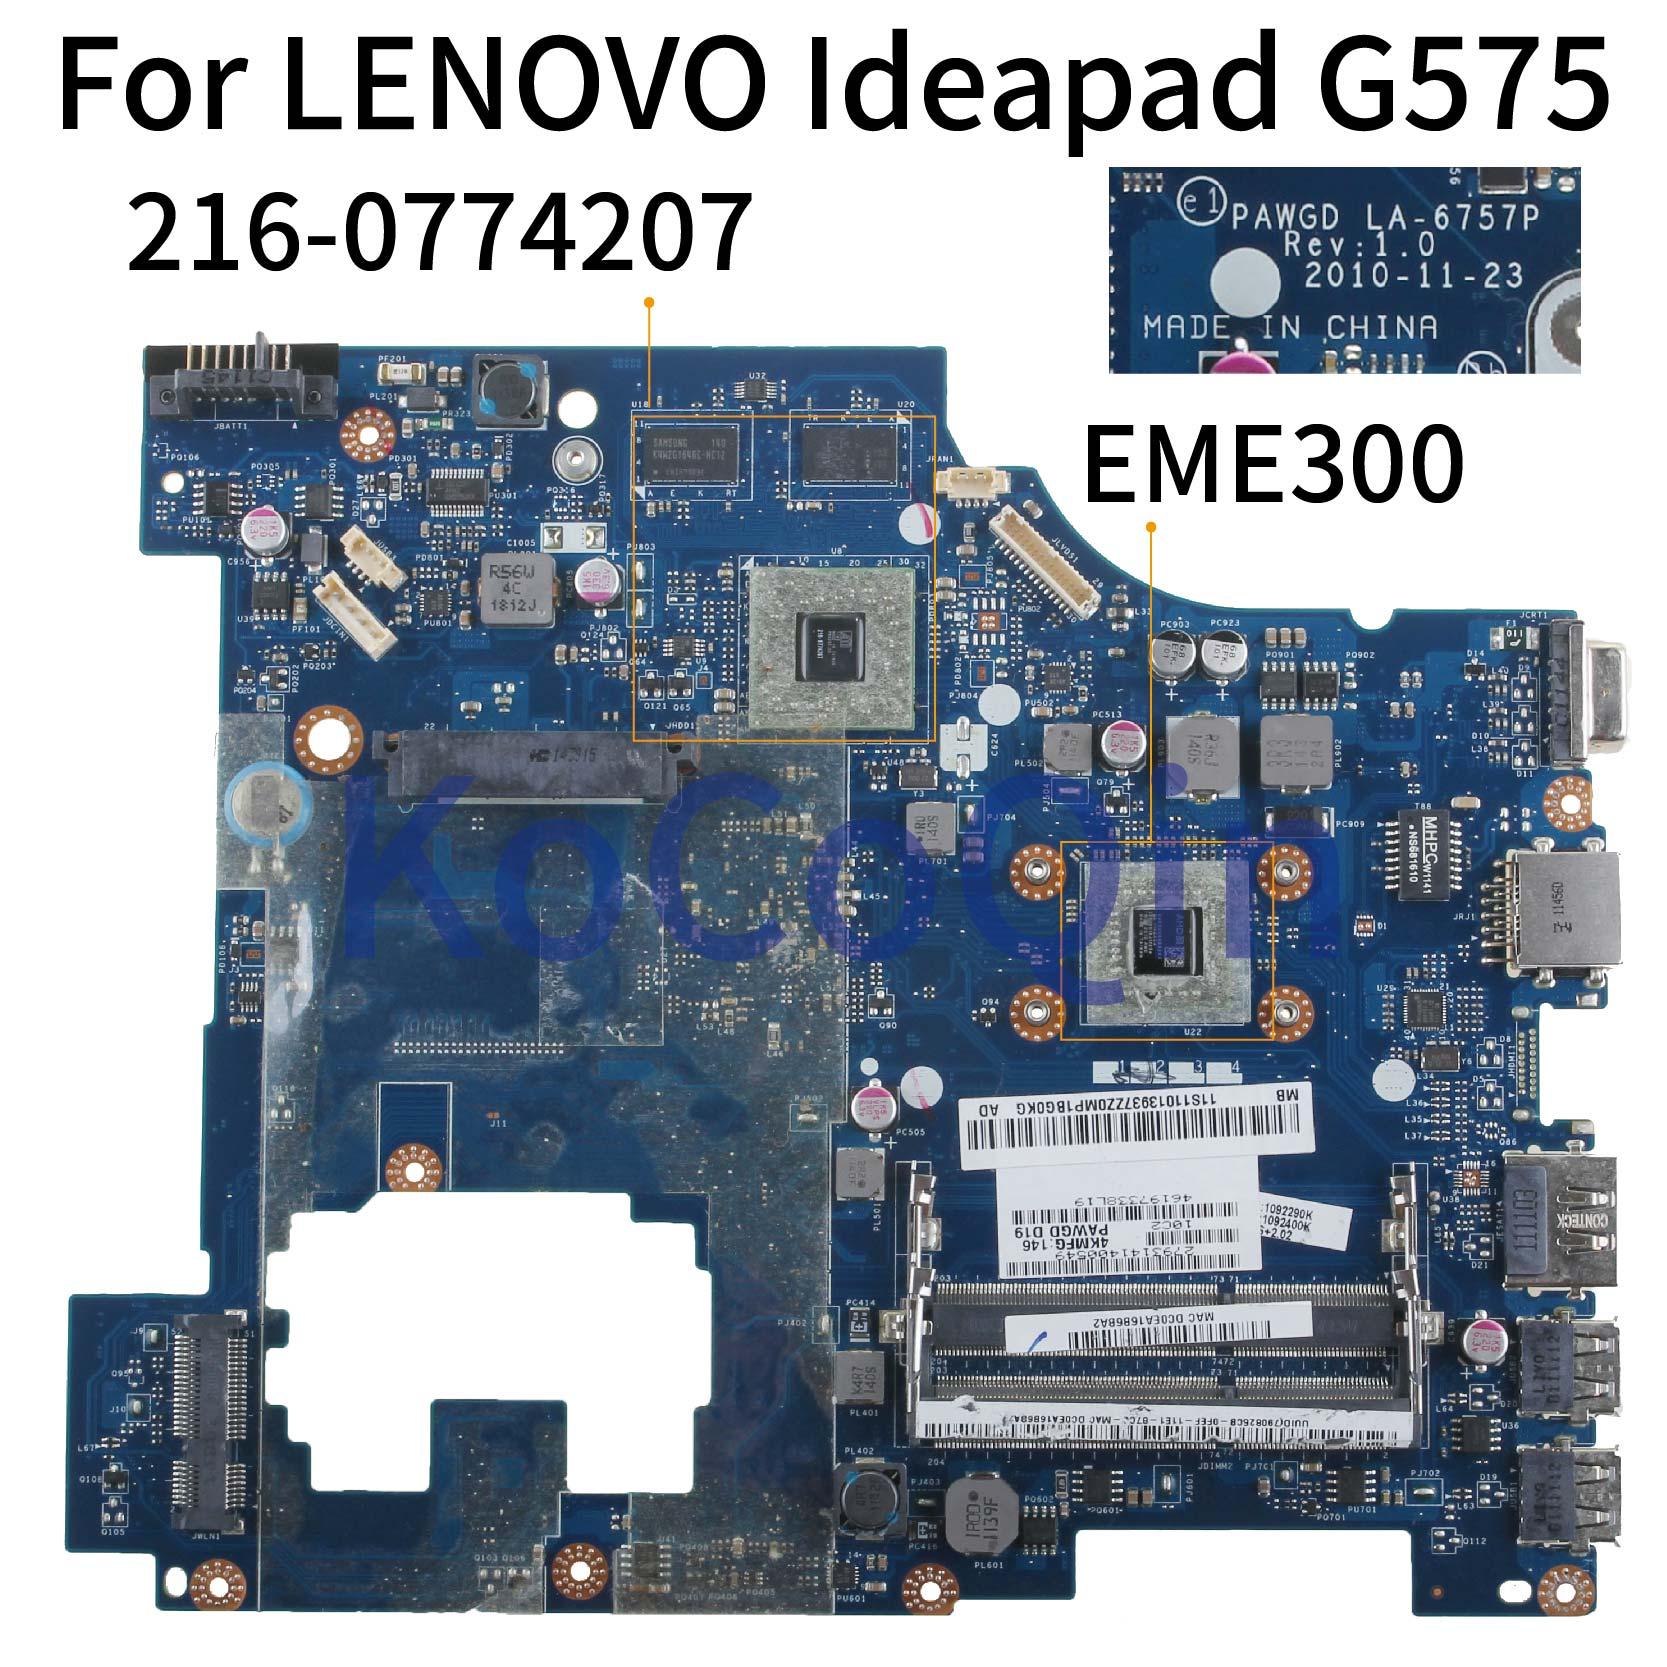 KoCoQin Laptop Motherboard For LENOVO Ideapad G575 EME300 Mainboard PAWGD LA-6757P 216-0774207